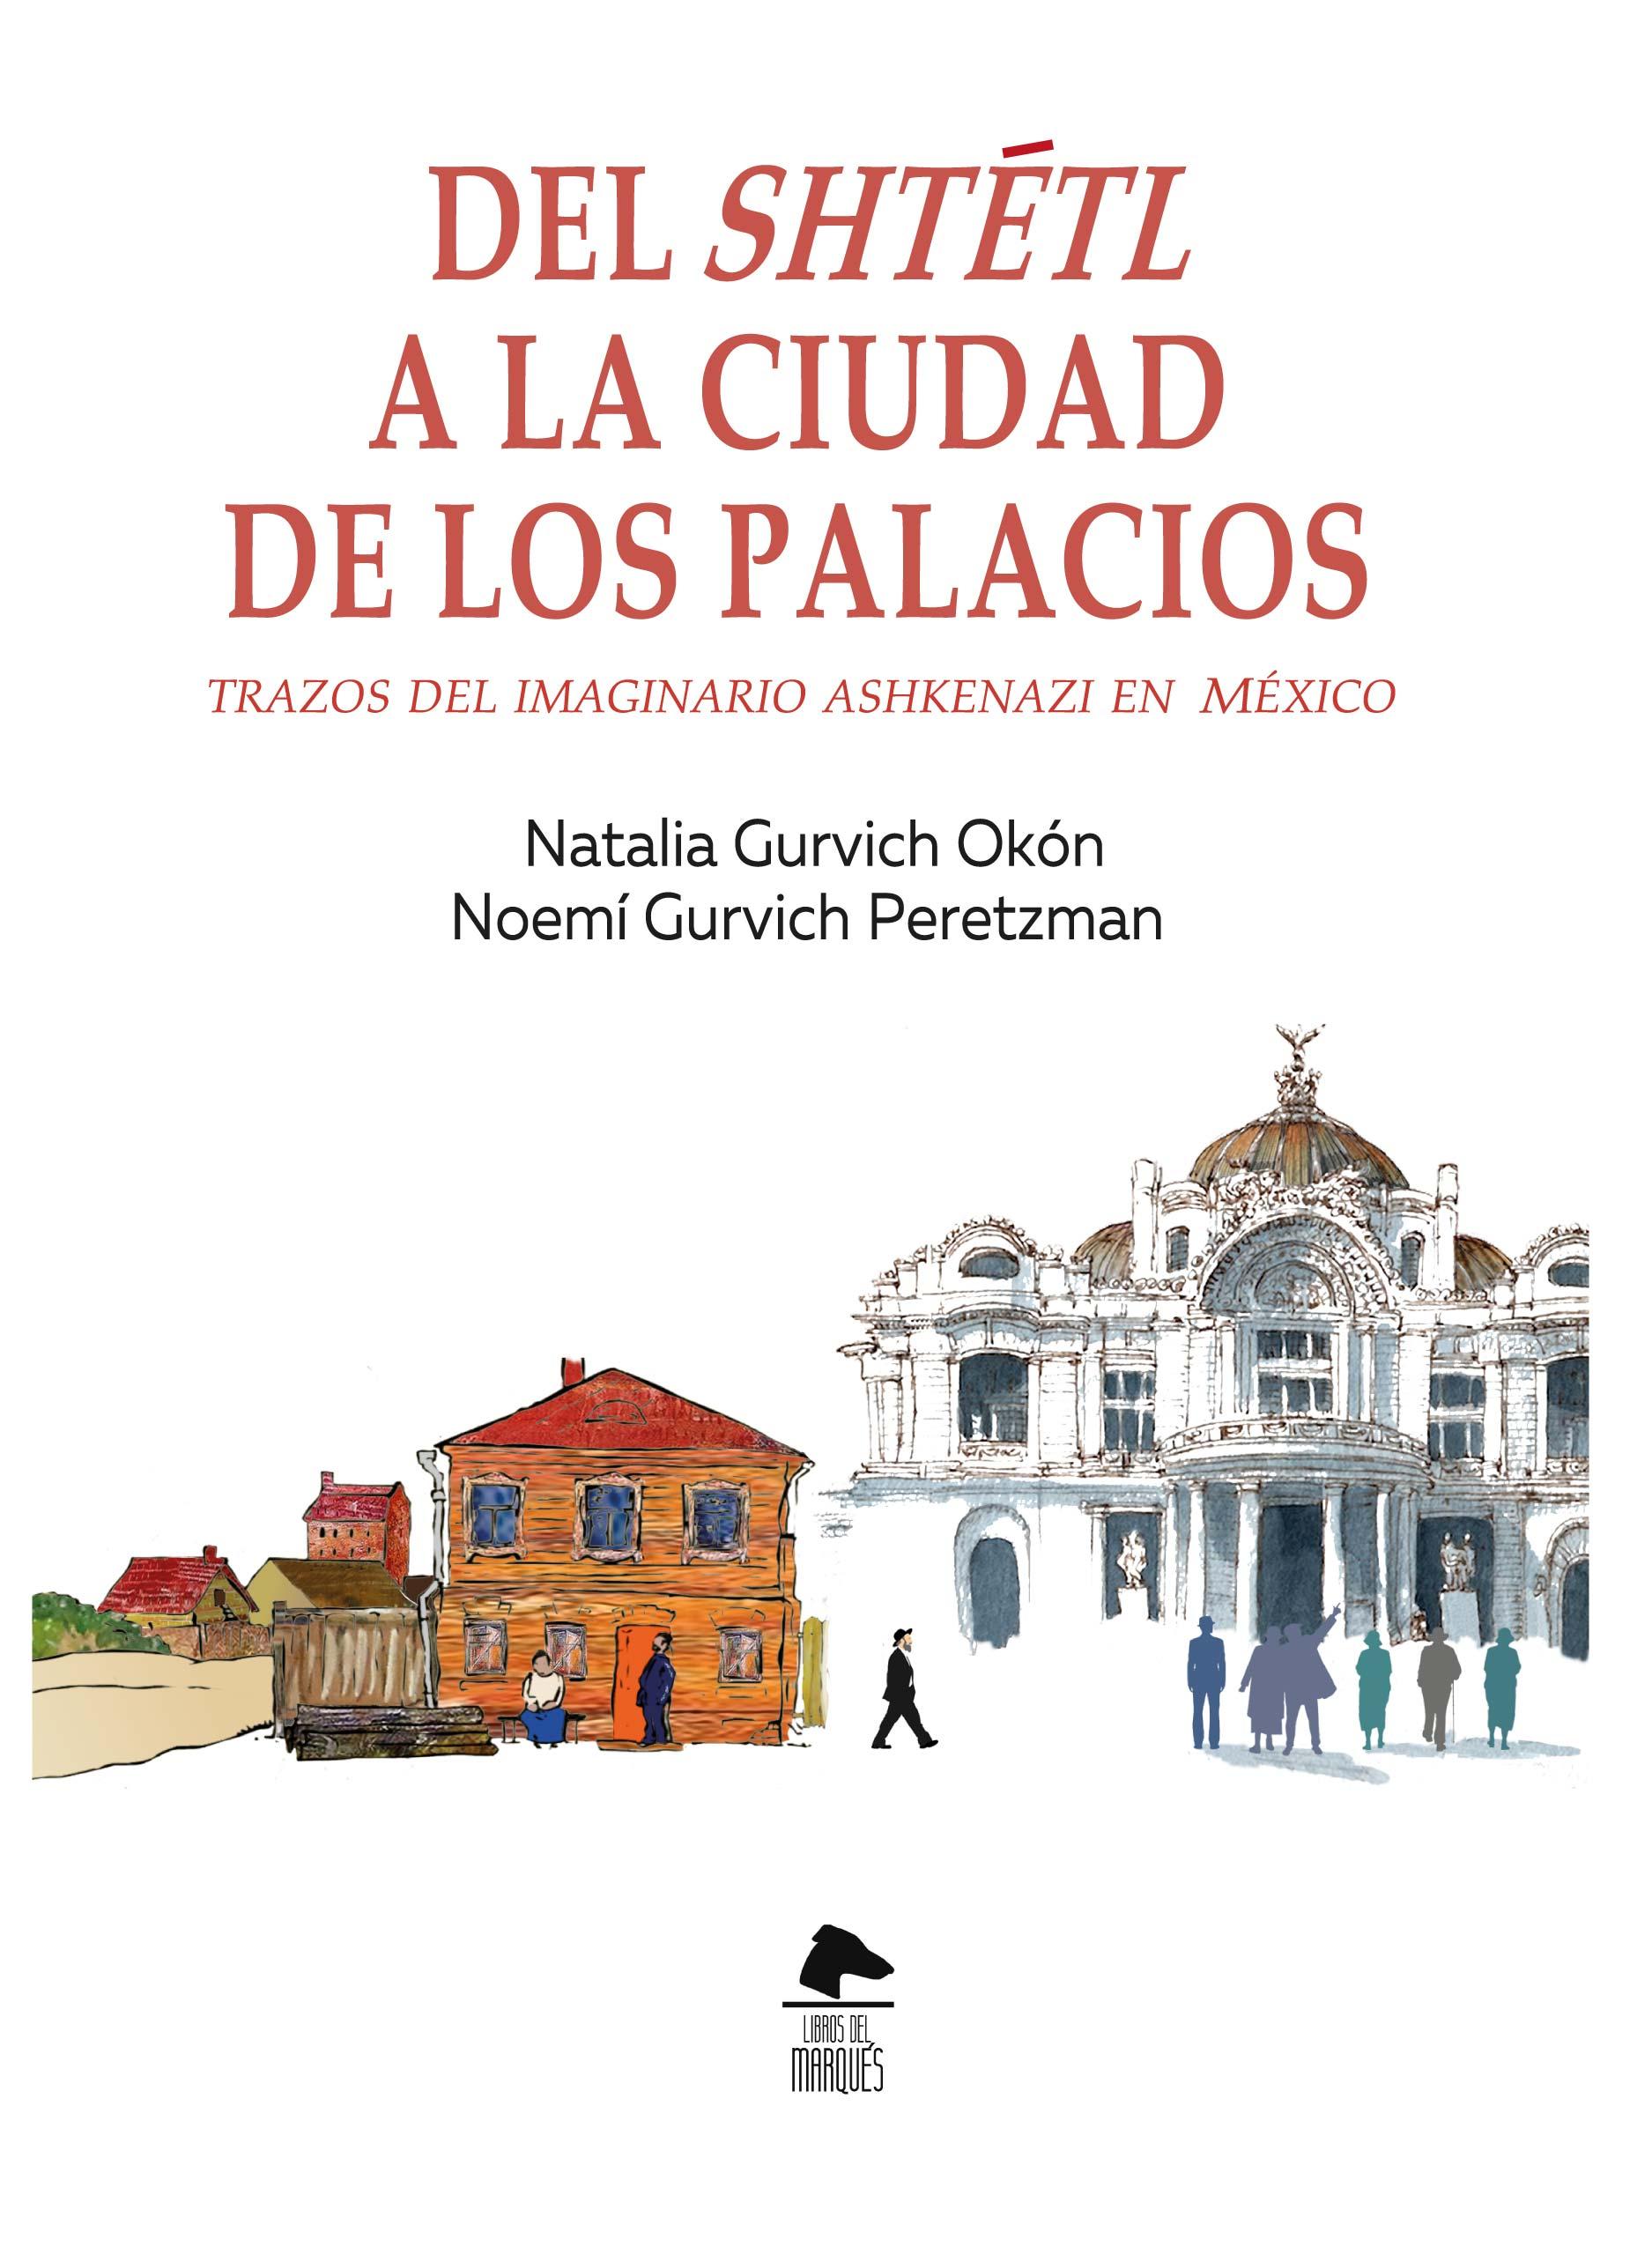 Del Shtélt a la Ciudad de los Palacios